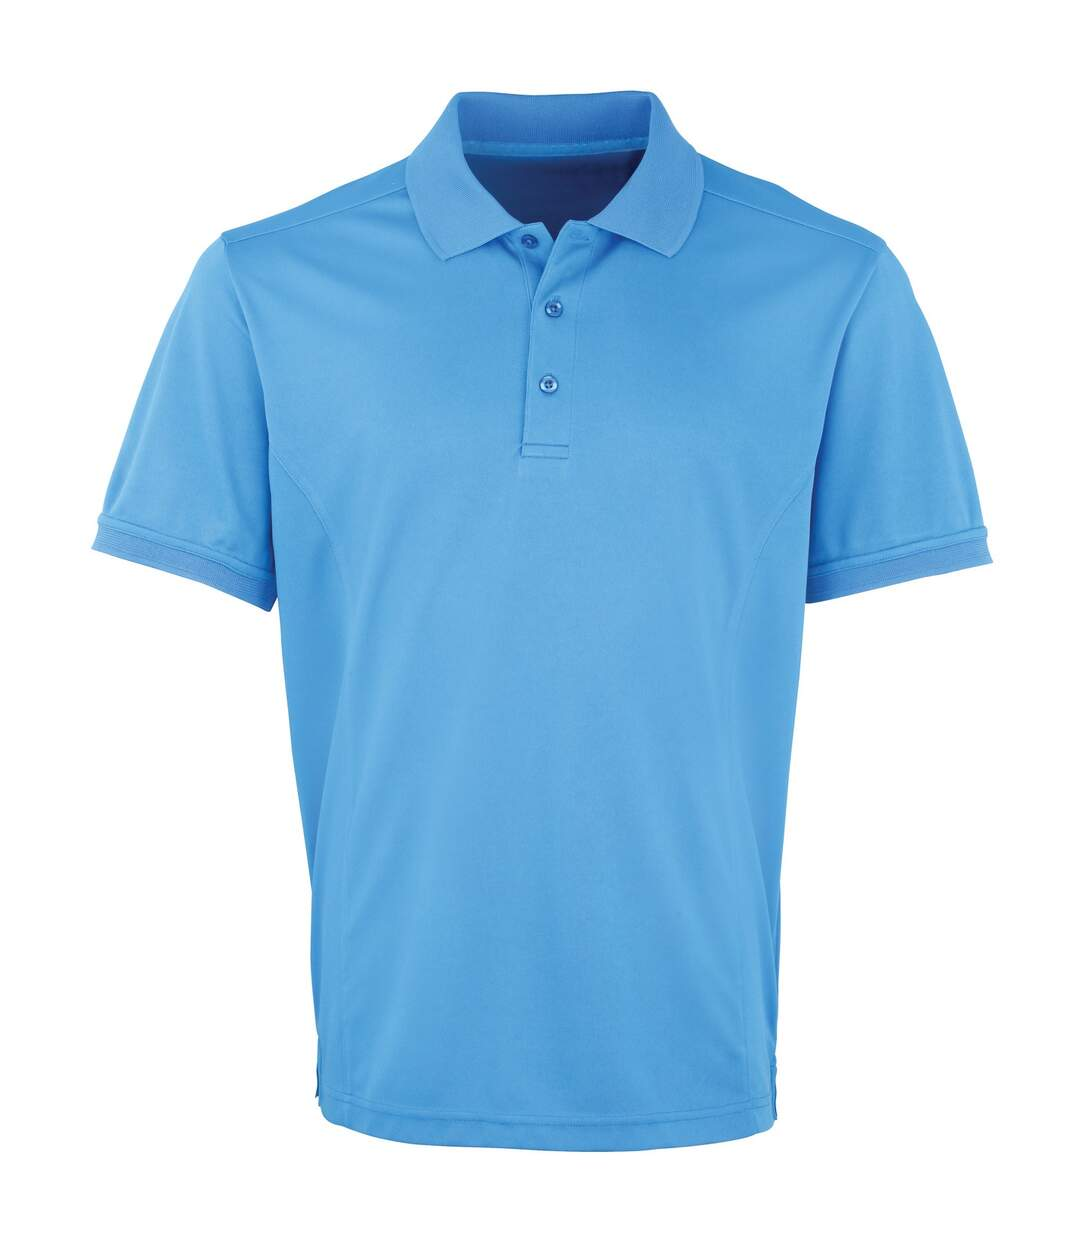 Premier Mens Coolchecker Pique Short Sleeve Polo T-Shirt (White) - UTRW4401